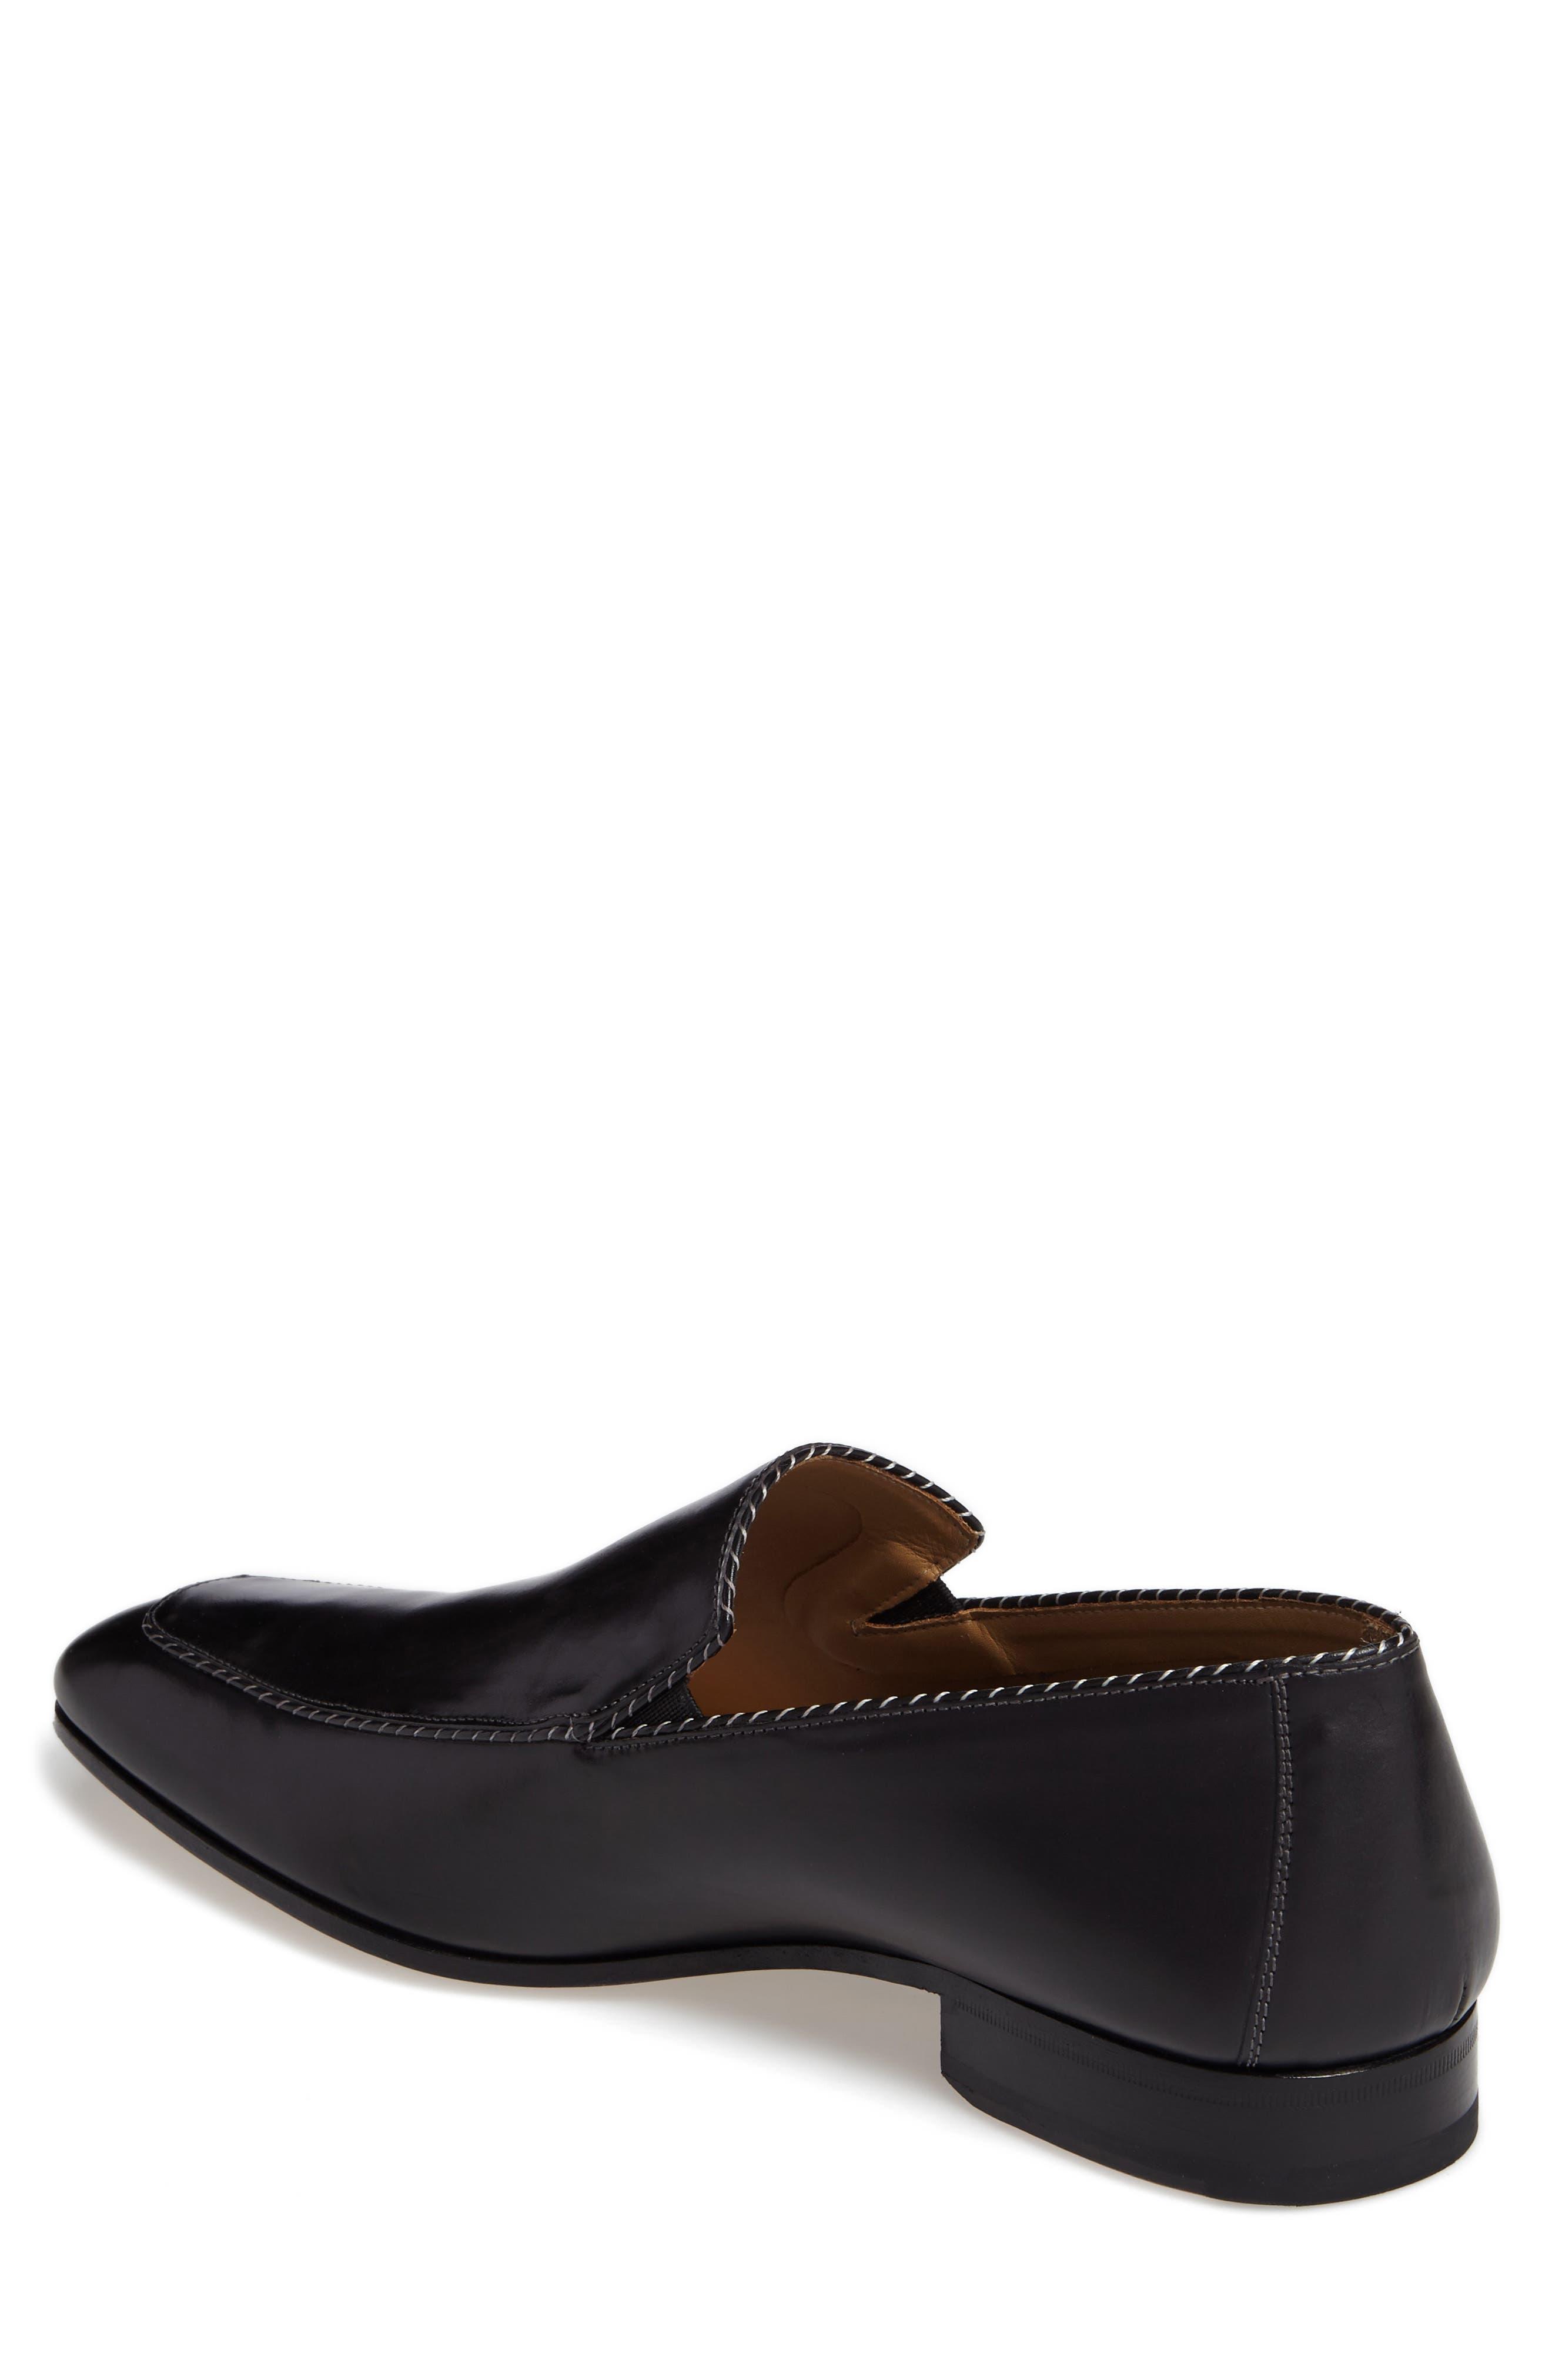 Brandt Venetian Loafer,                             Alternate thumbnail 2, color,                             Black Leather